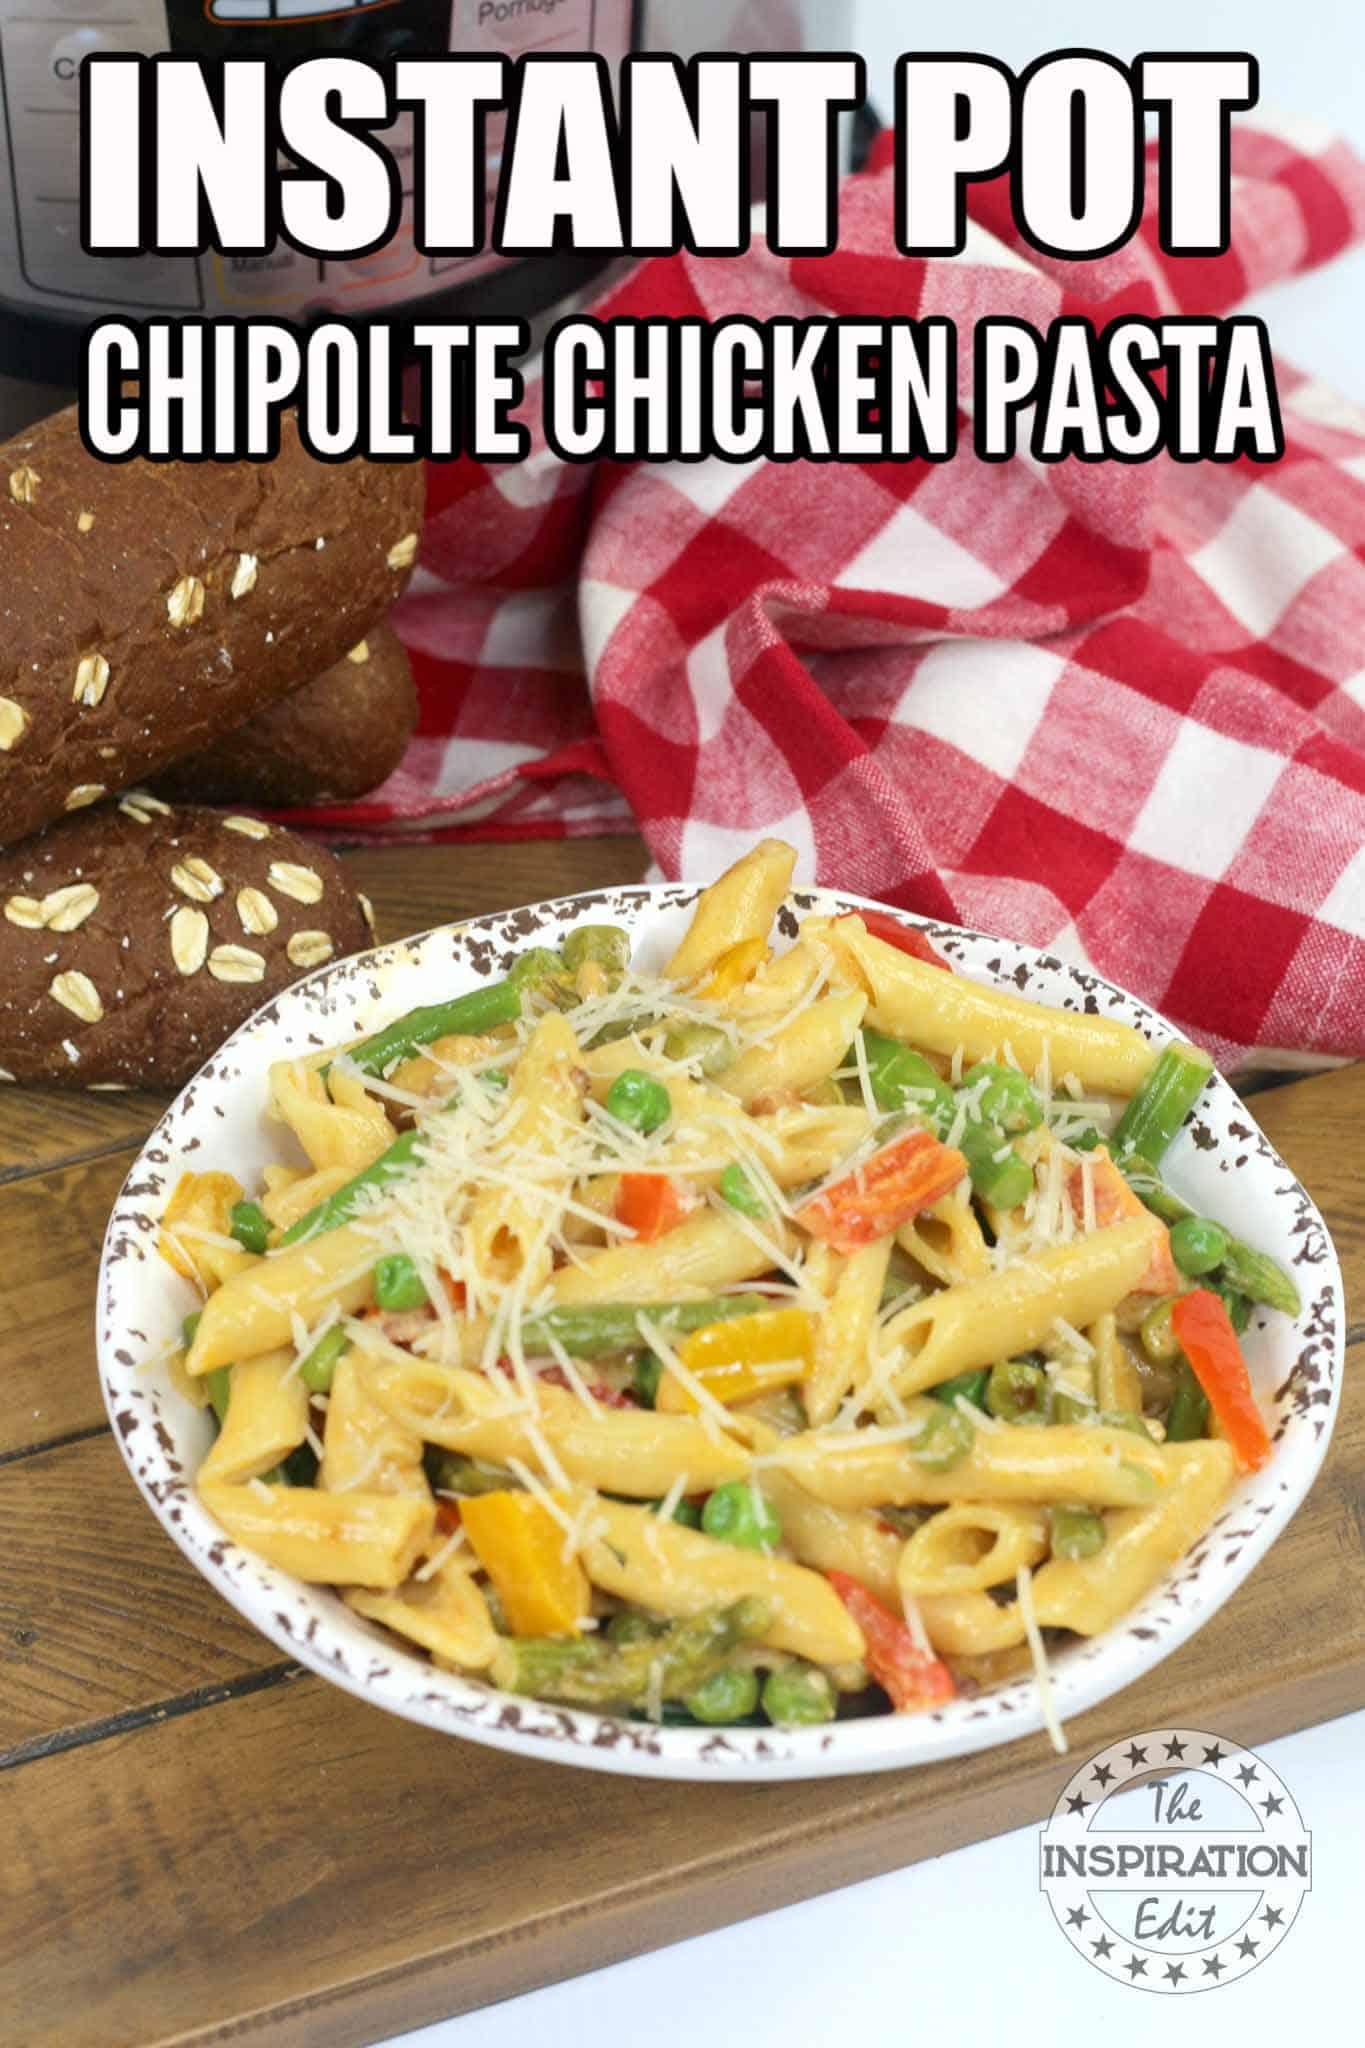 InstantPot Chicken Pasta